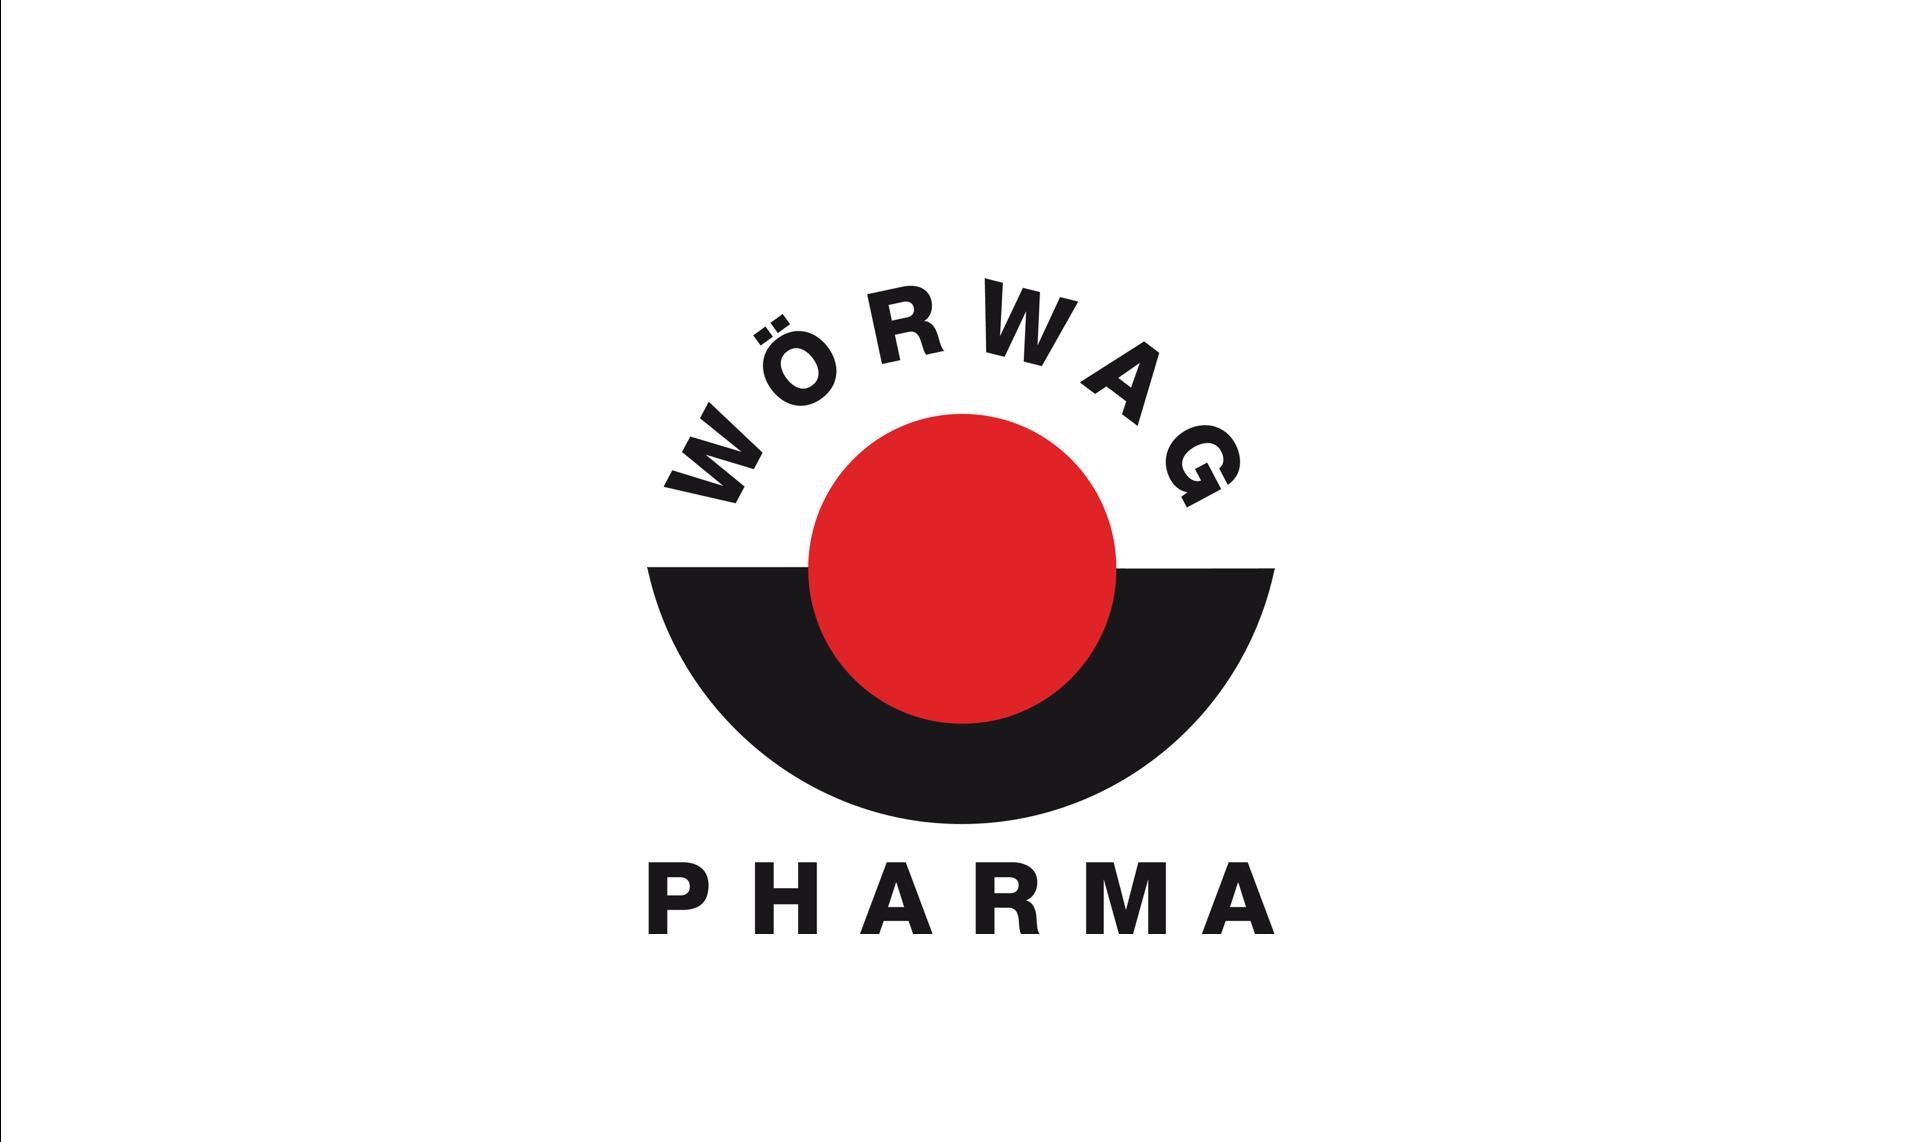 Worwag pharma.png